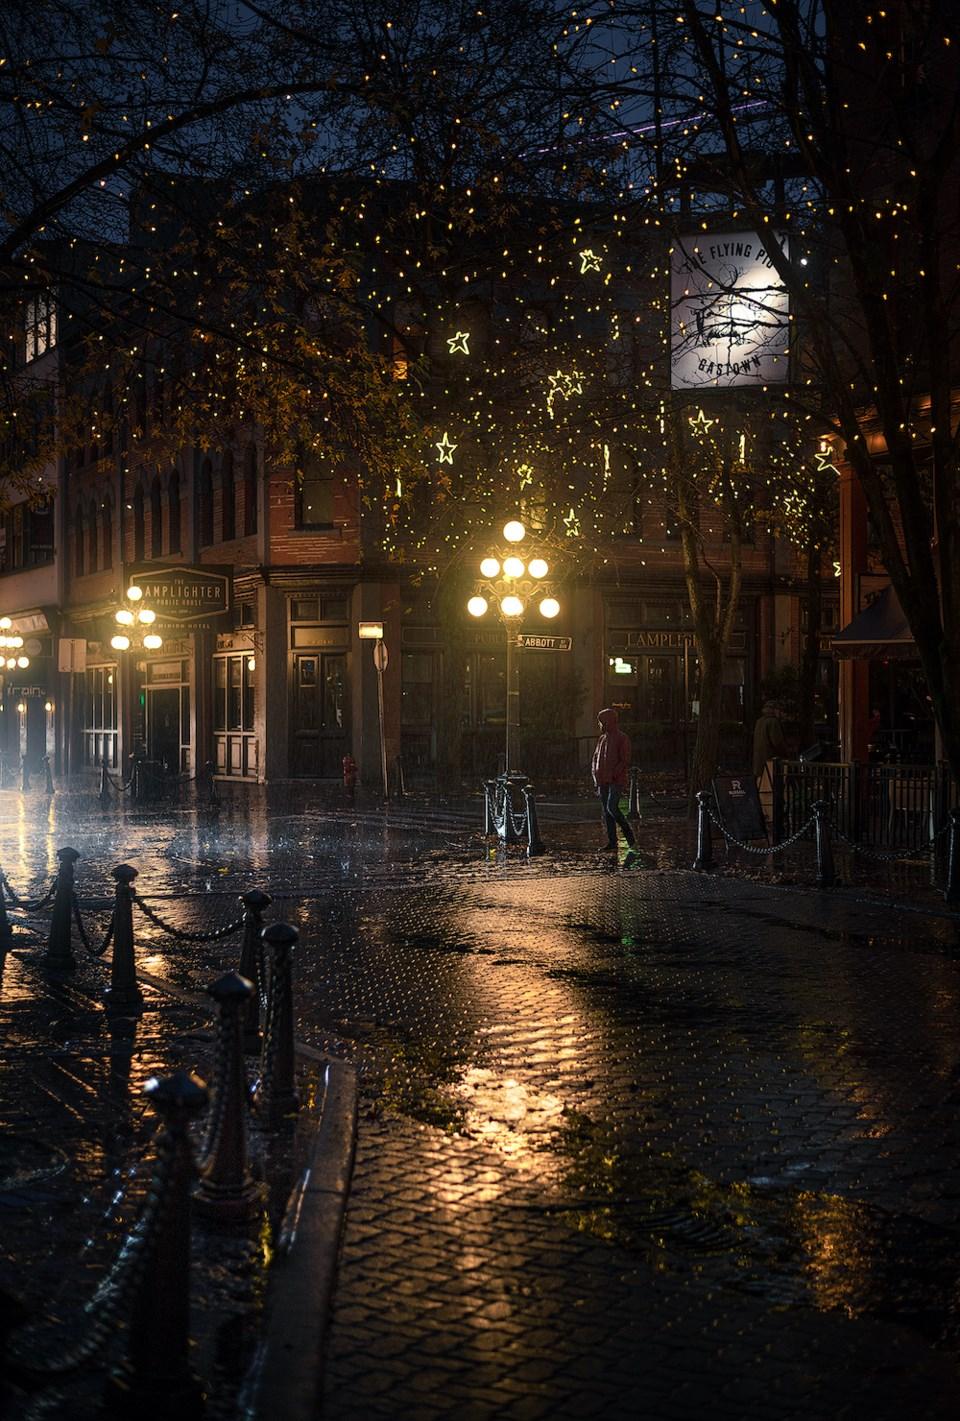 Vancouver-Gastown-lights-2020